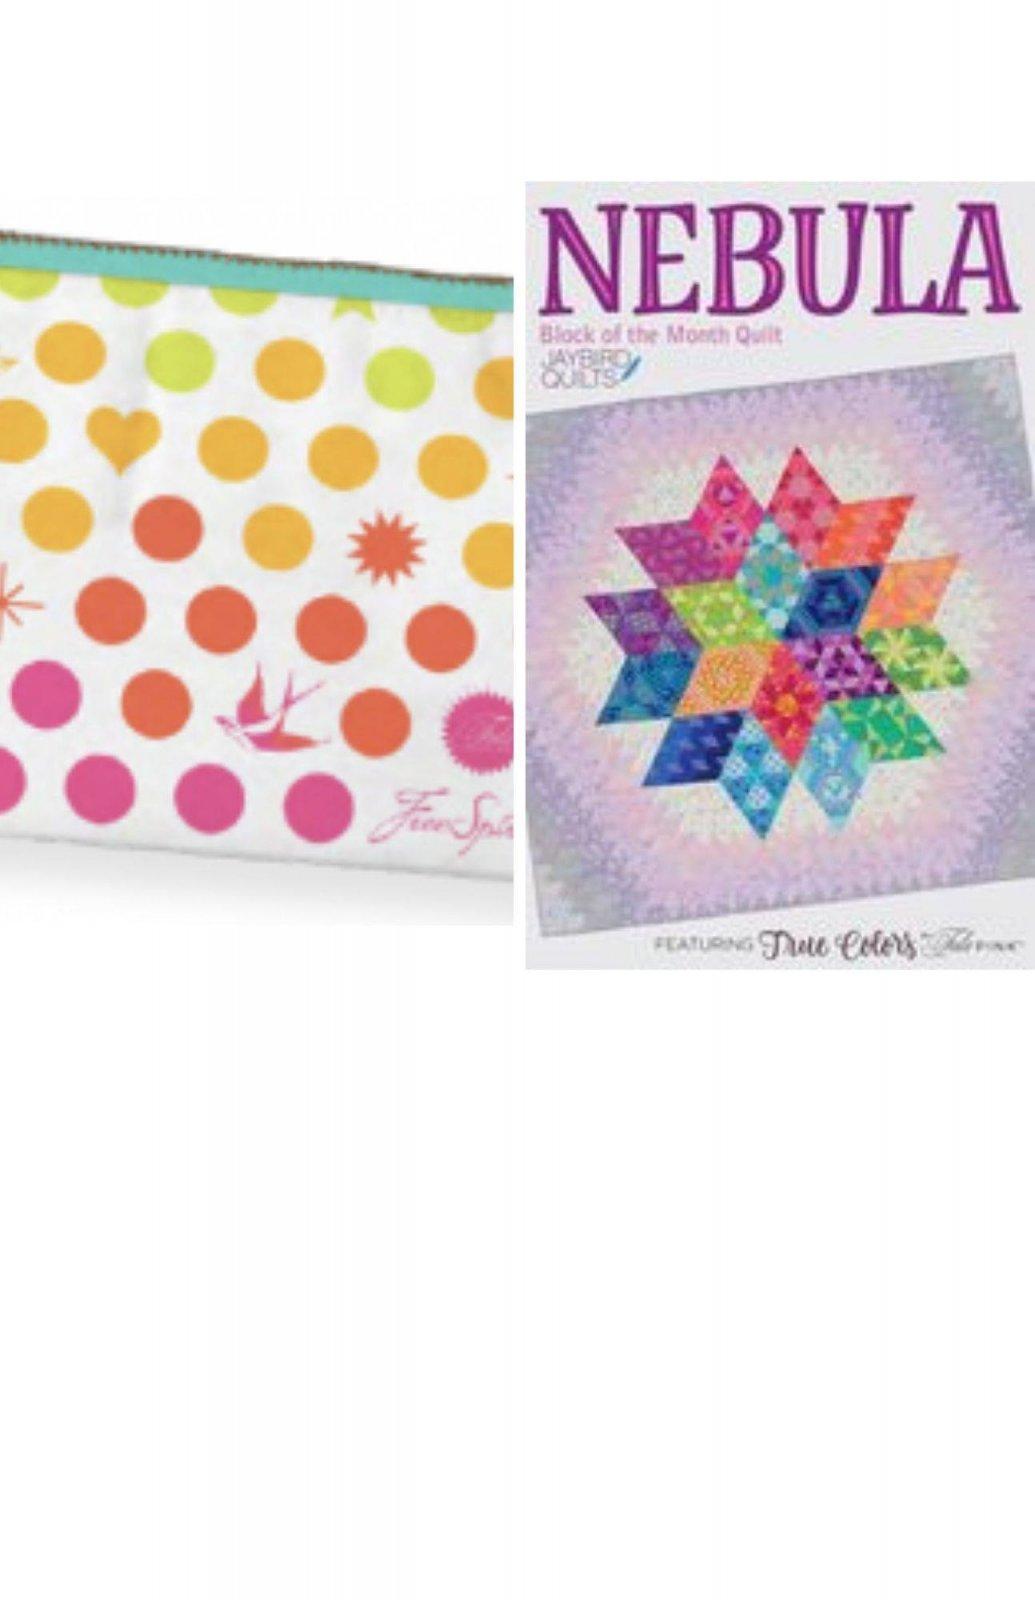 Nebula BOM includes SWAG! Kit 8